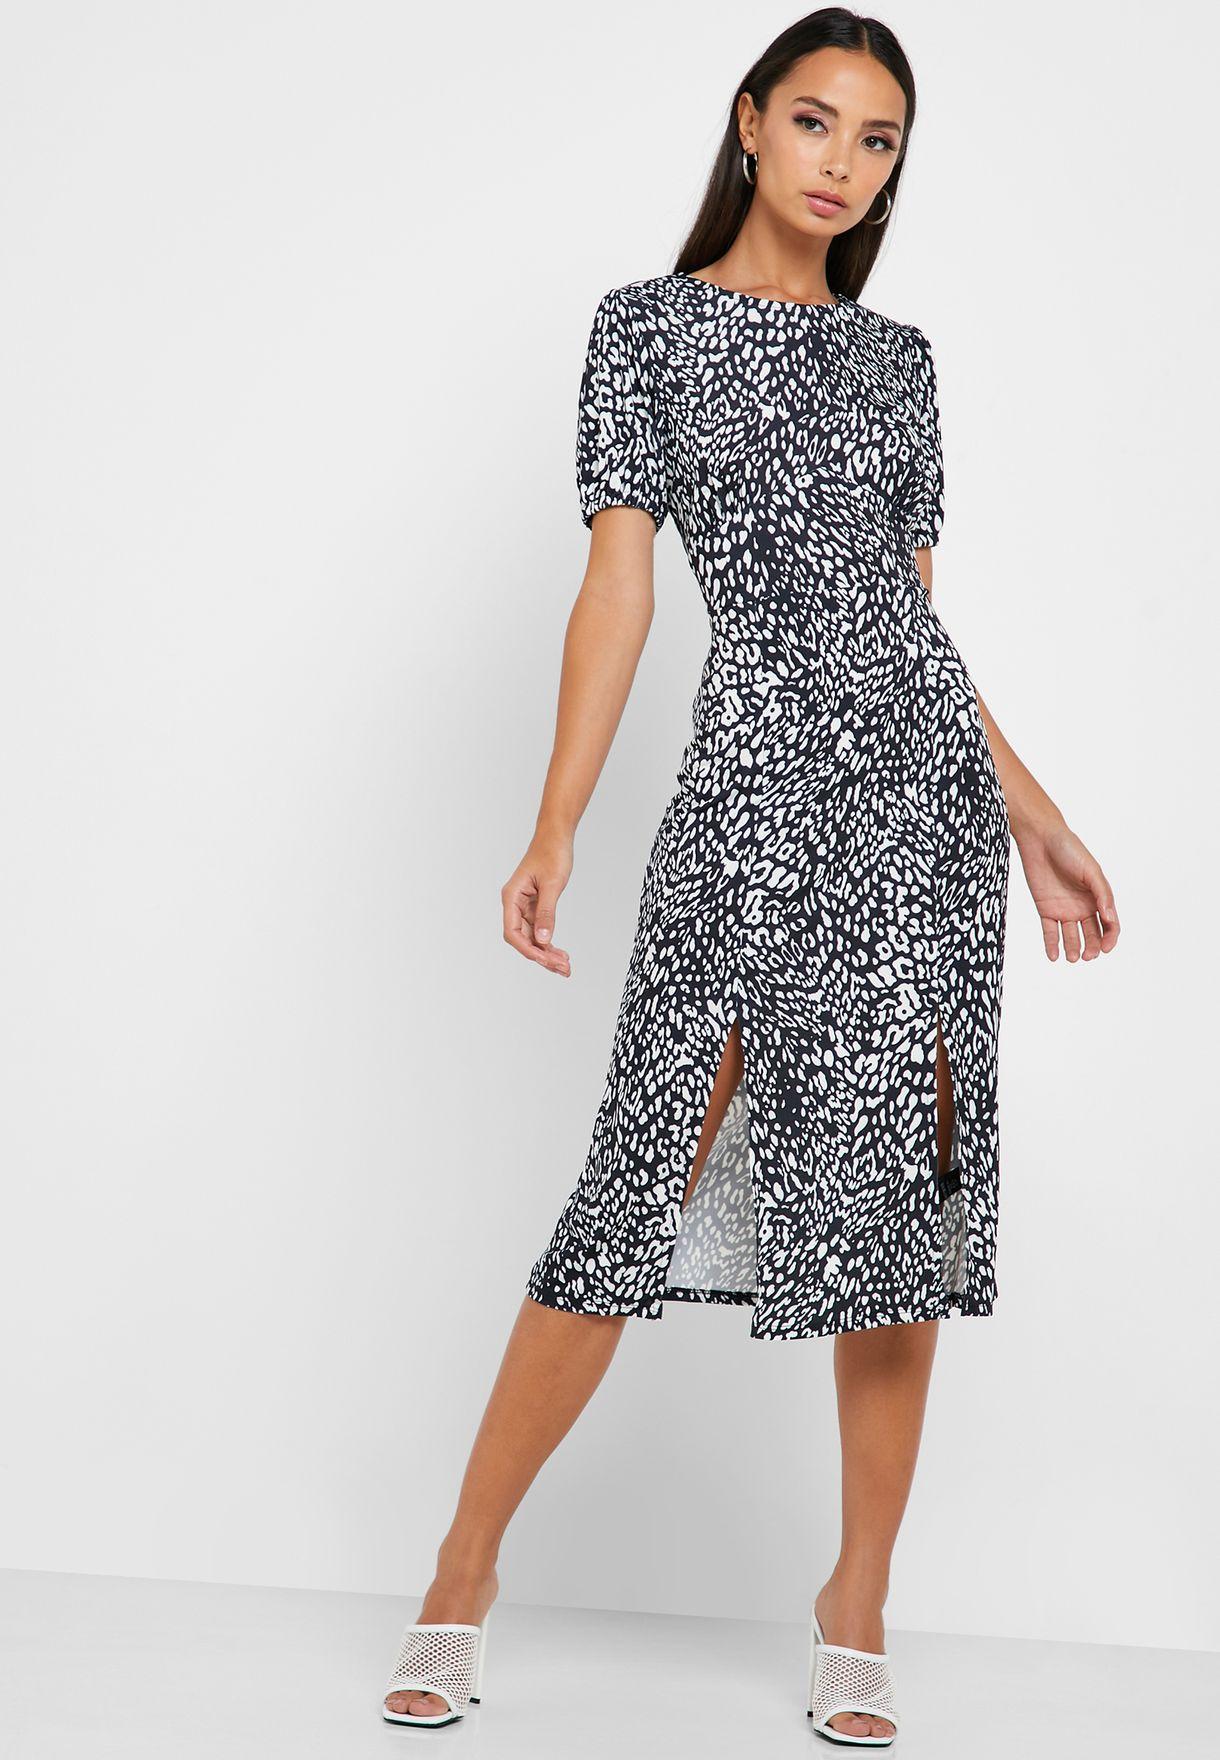 Leopard Print Front Slit Dress